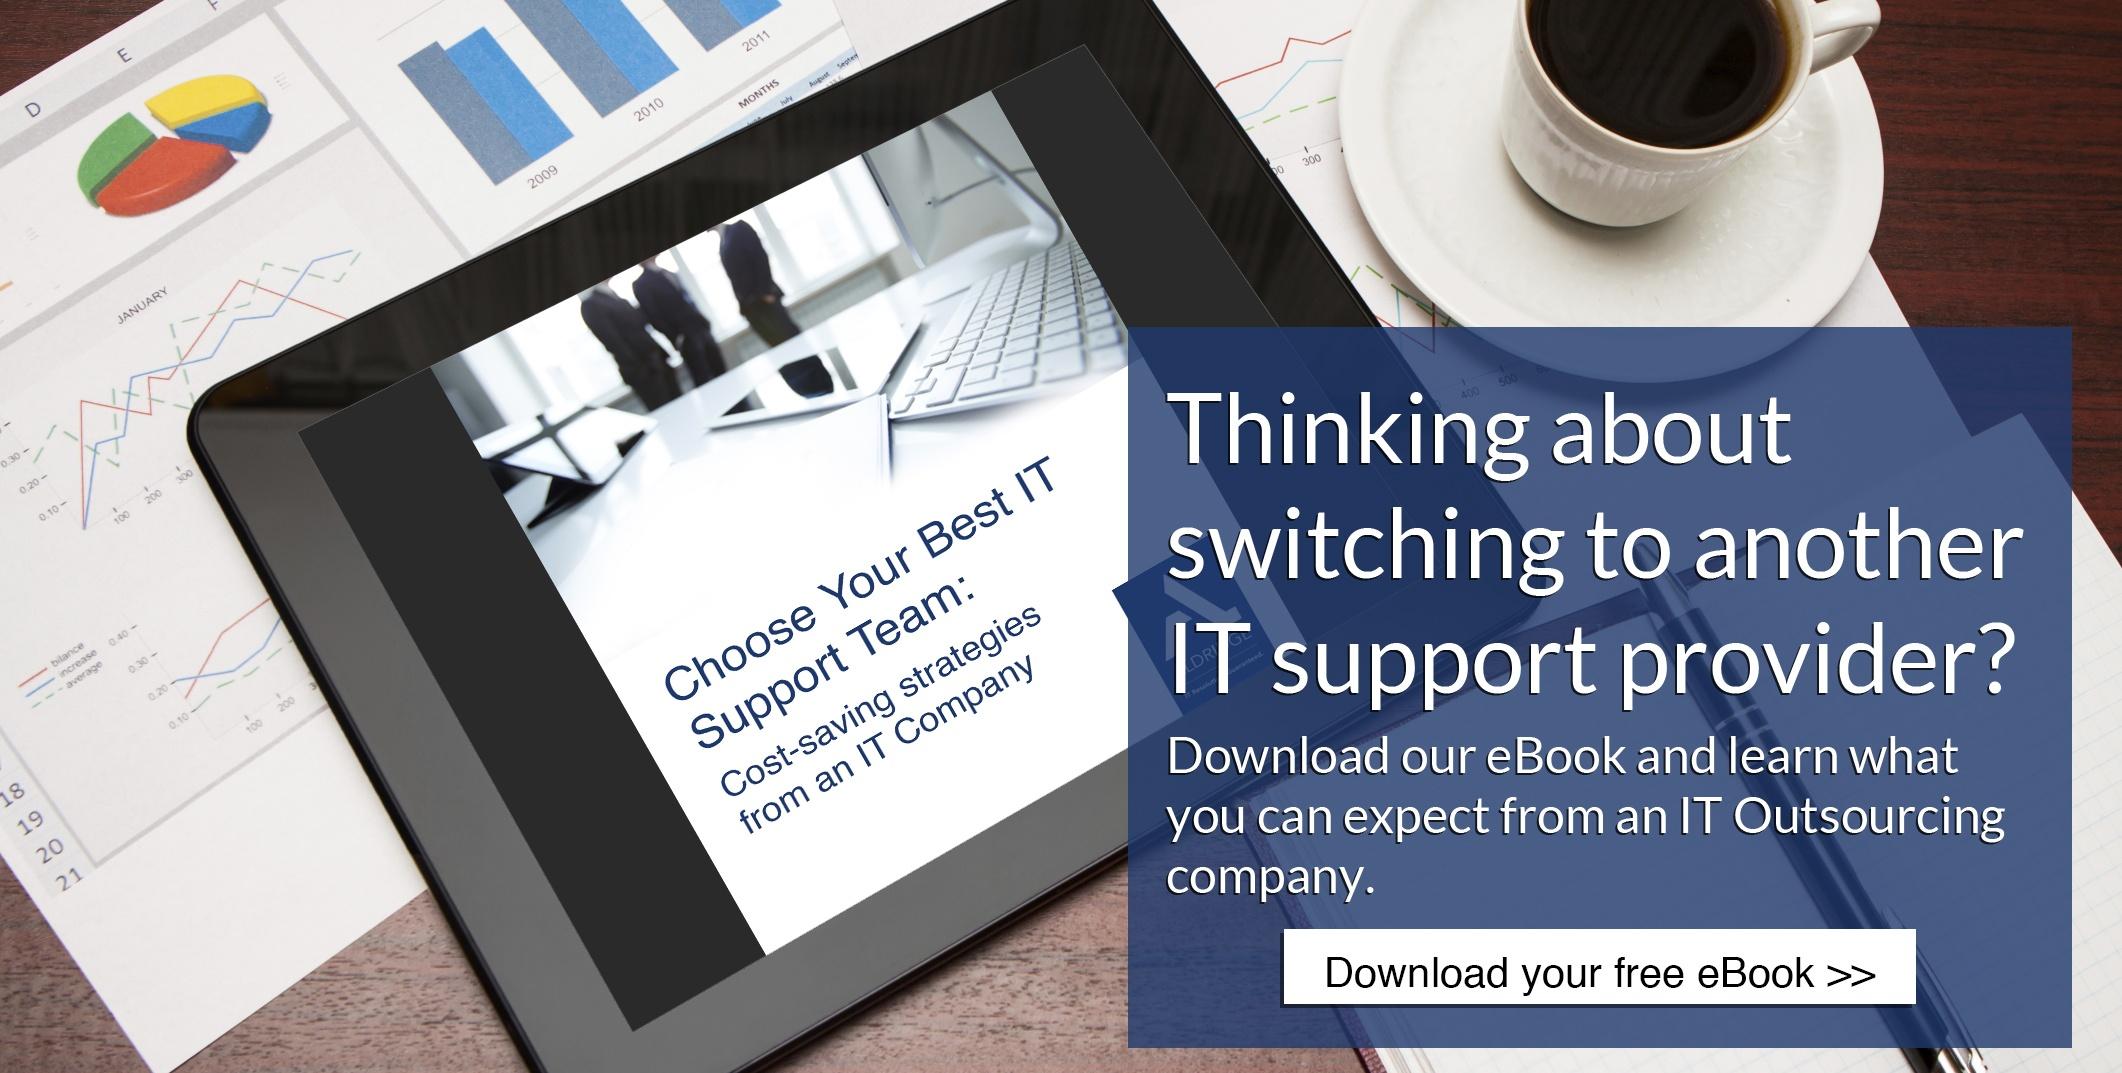 IT-Support-eBook-Inline-CTA-Blog-1.jpg